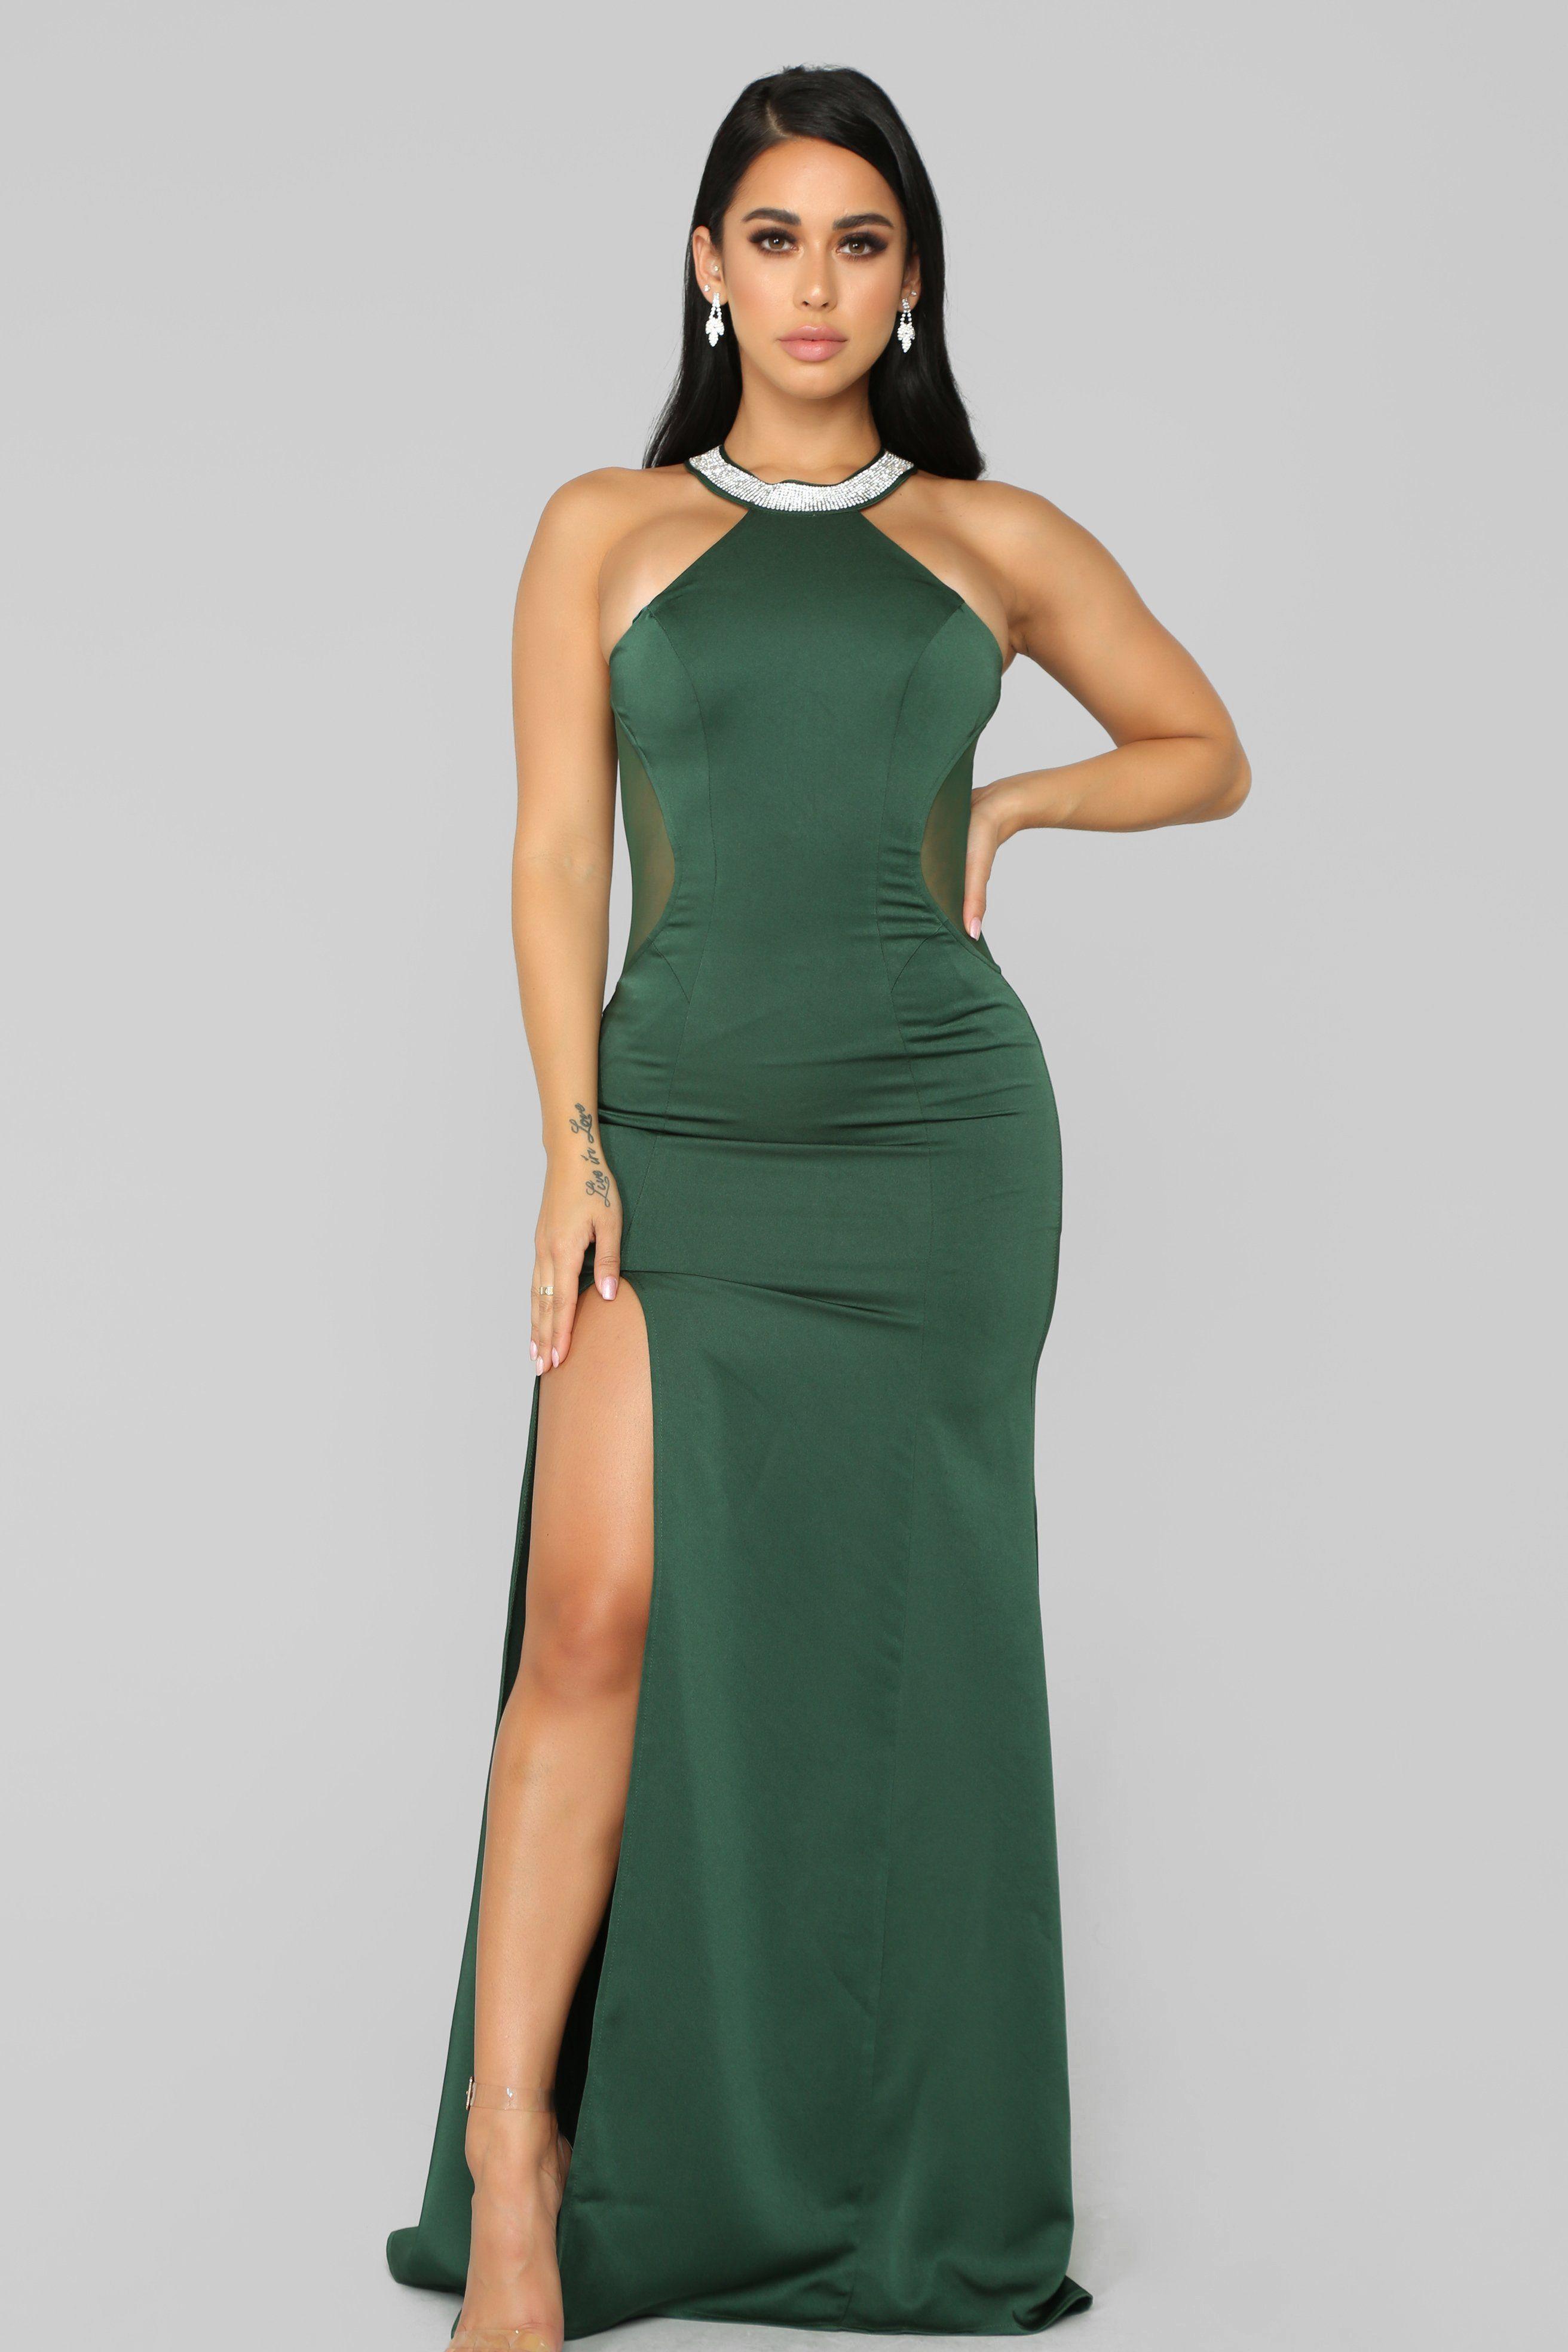 Twisted Love Maxi Dress Emerald Dresses, Fashion, Maxi